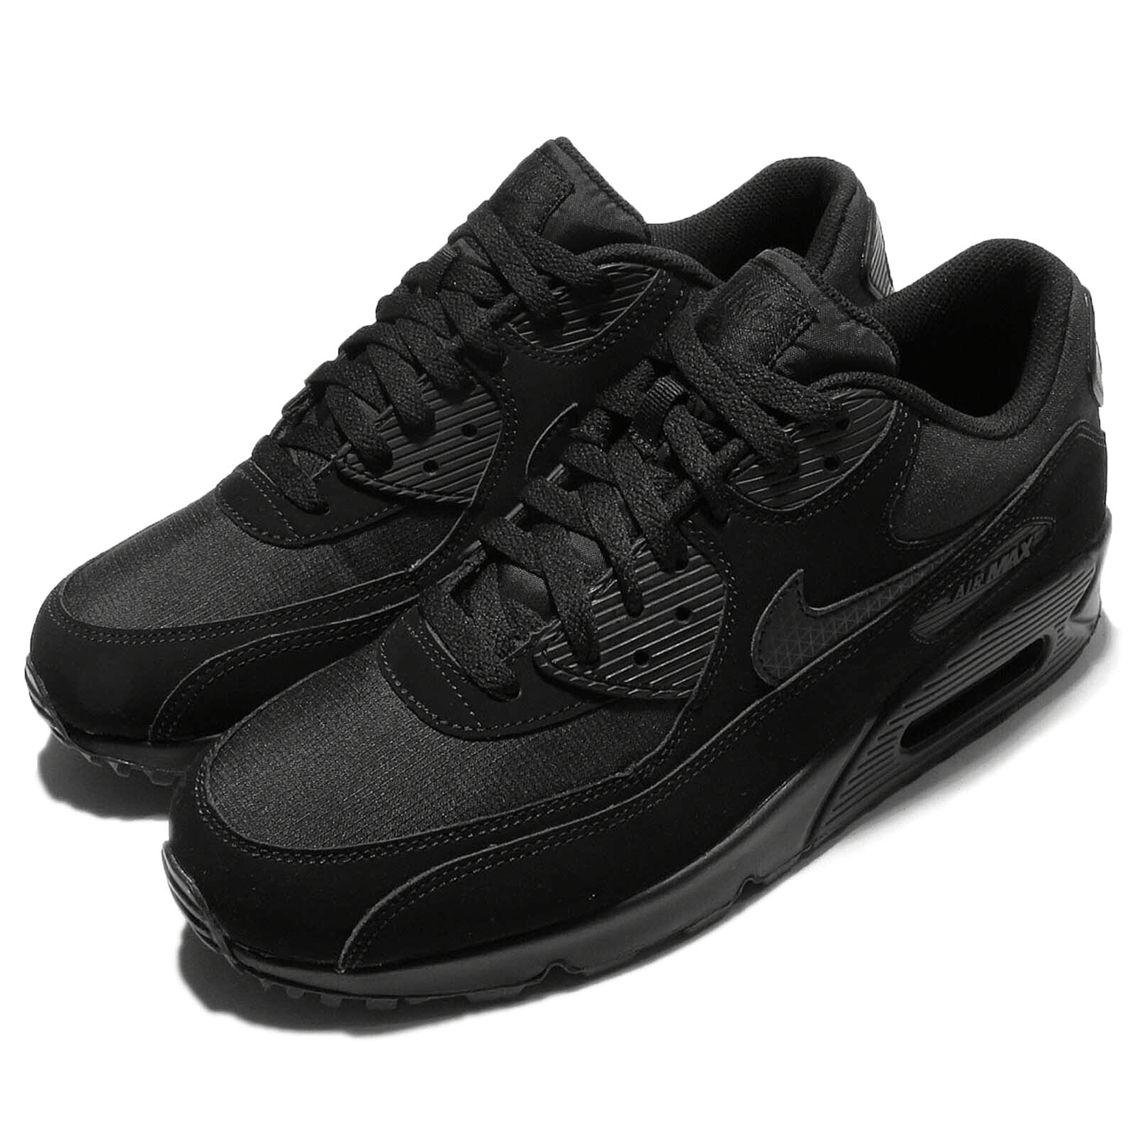 Nike Air Max 90 Essential Triple Black Classic Mens Running Shoes ...